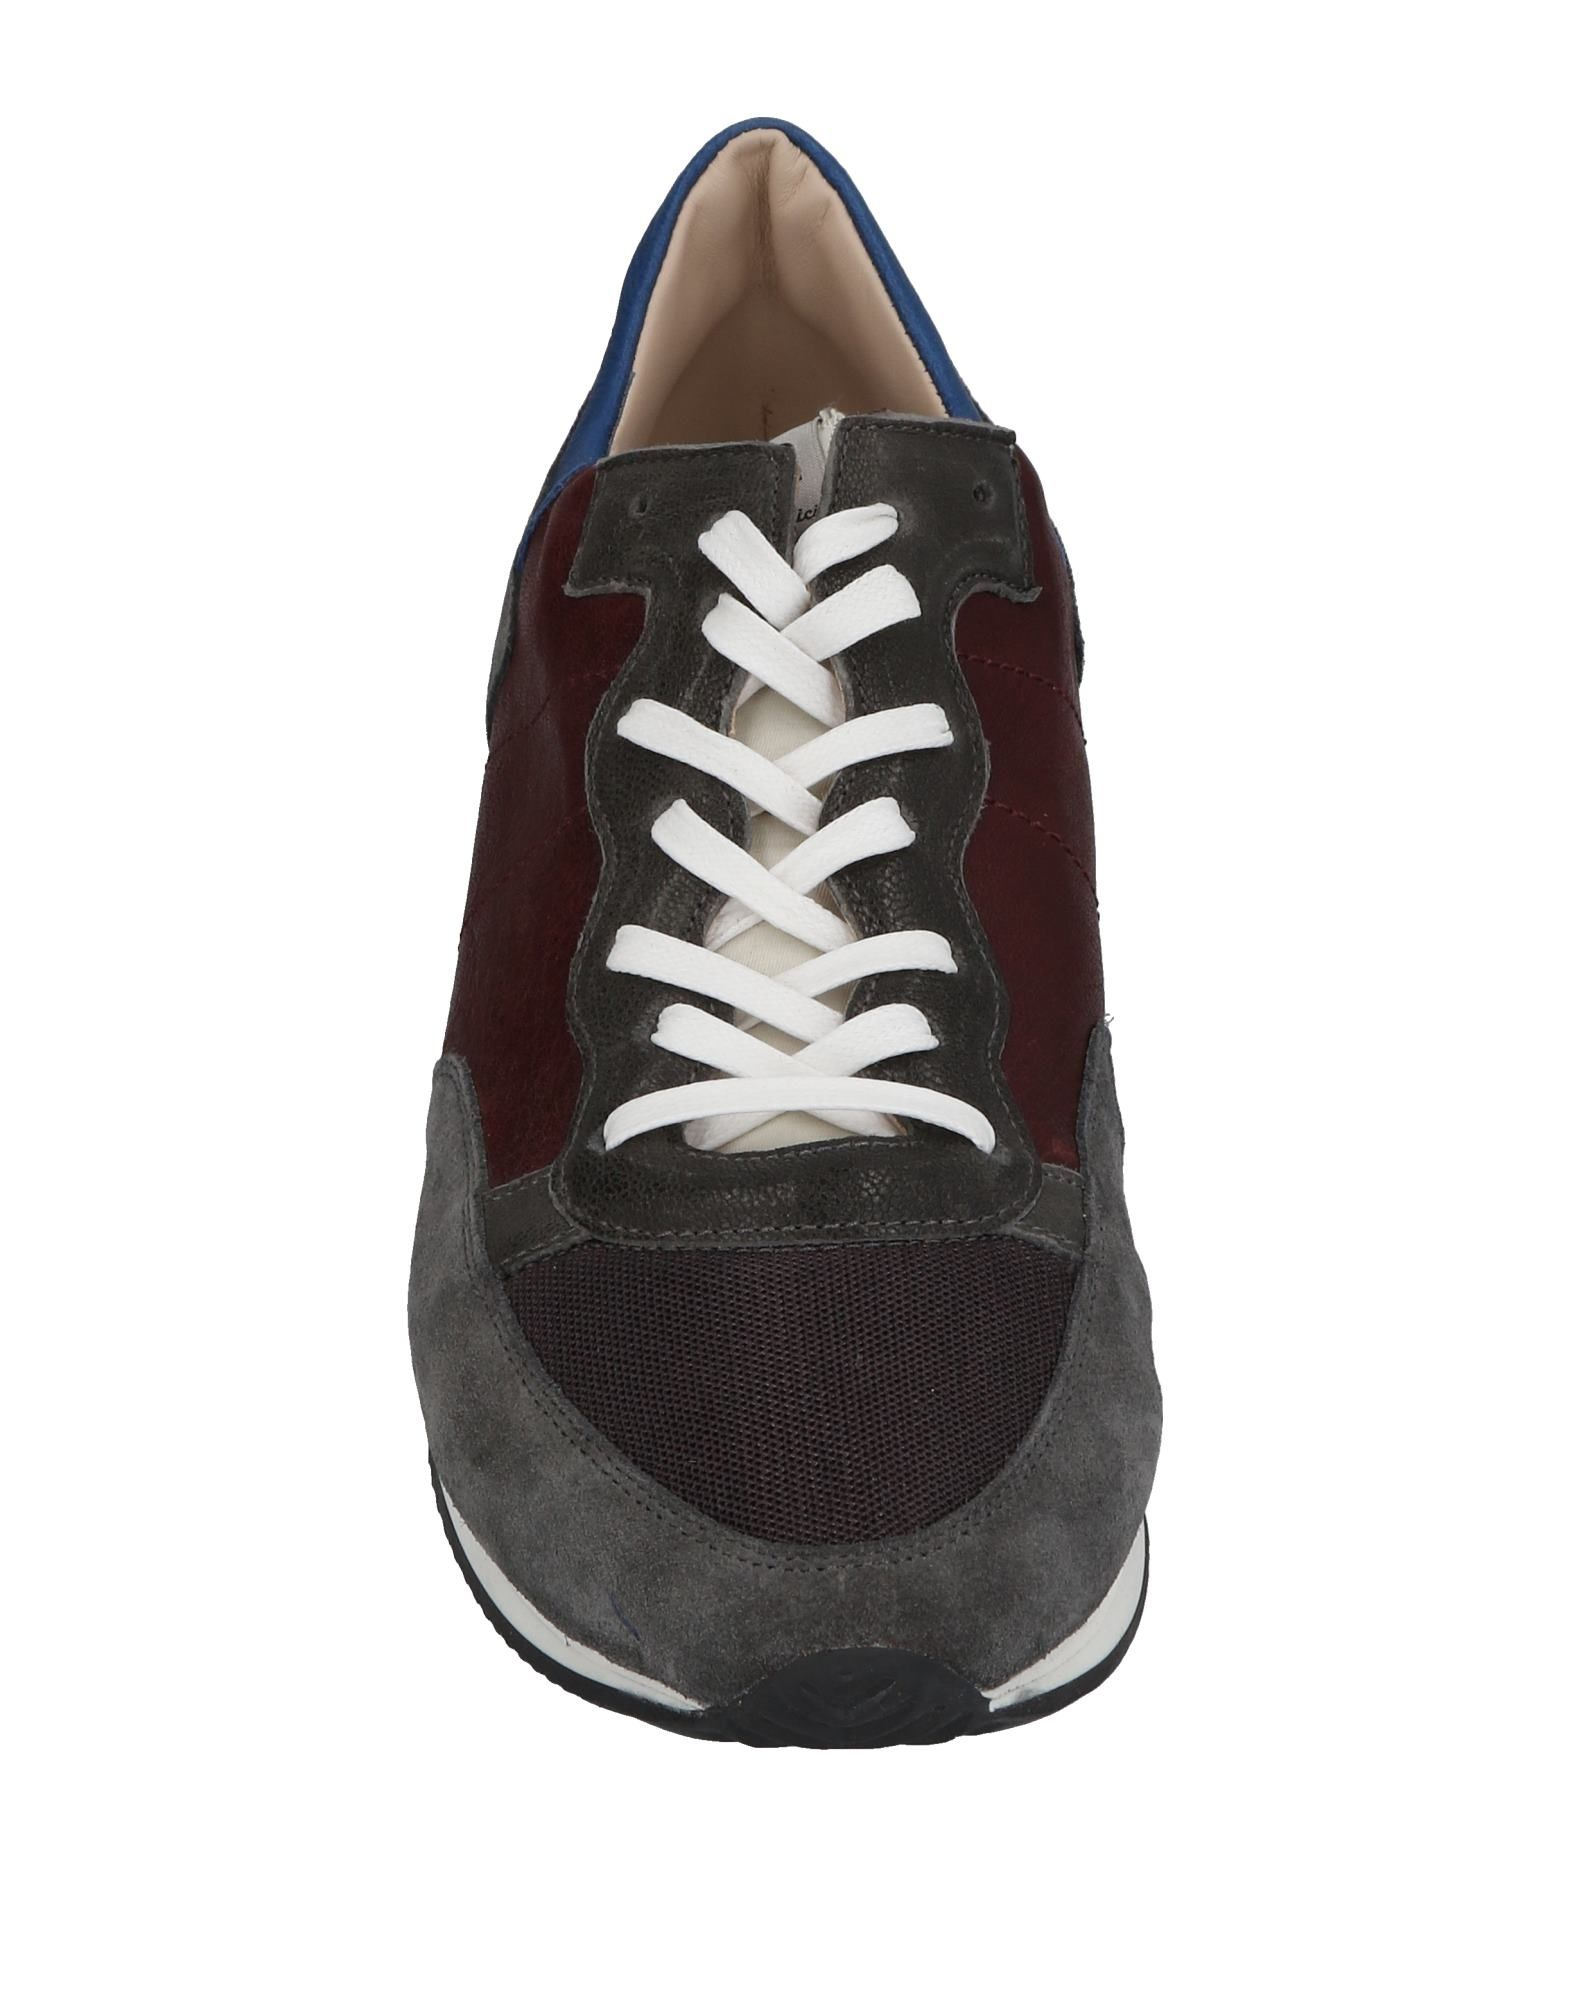 11459007CM Quattrobarradodici Sneakers Herren  11459007CM  485025